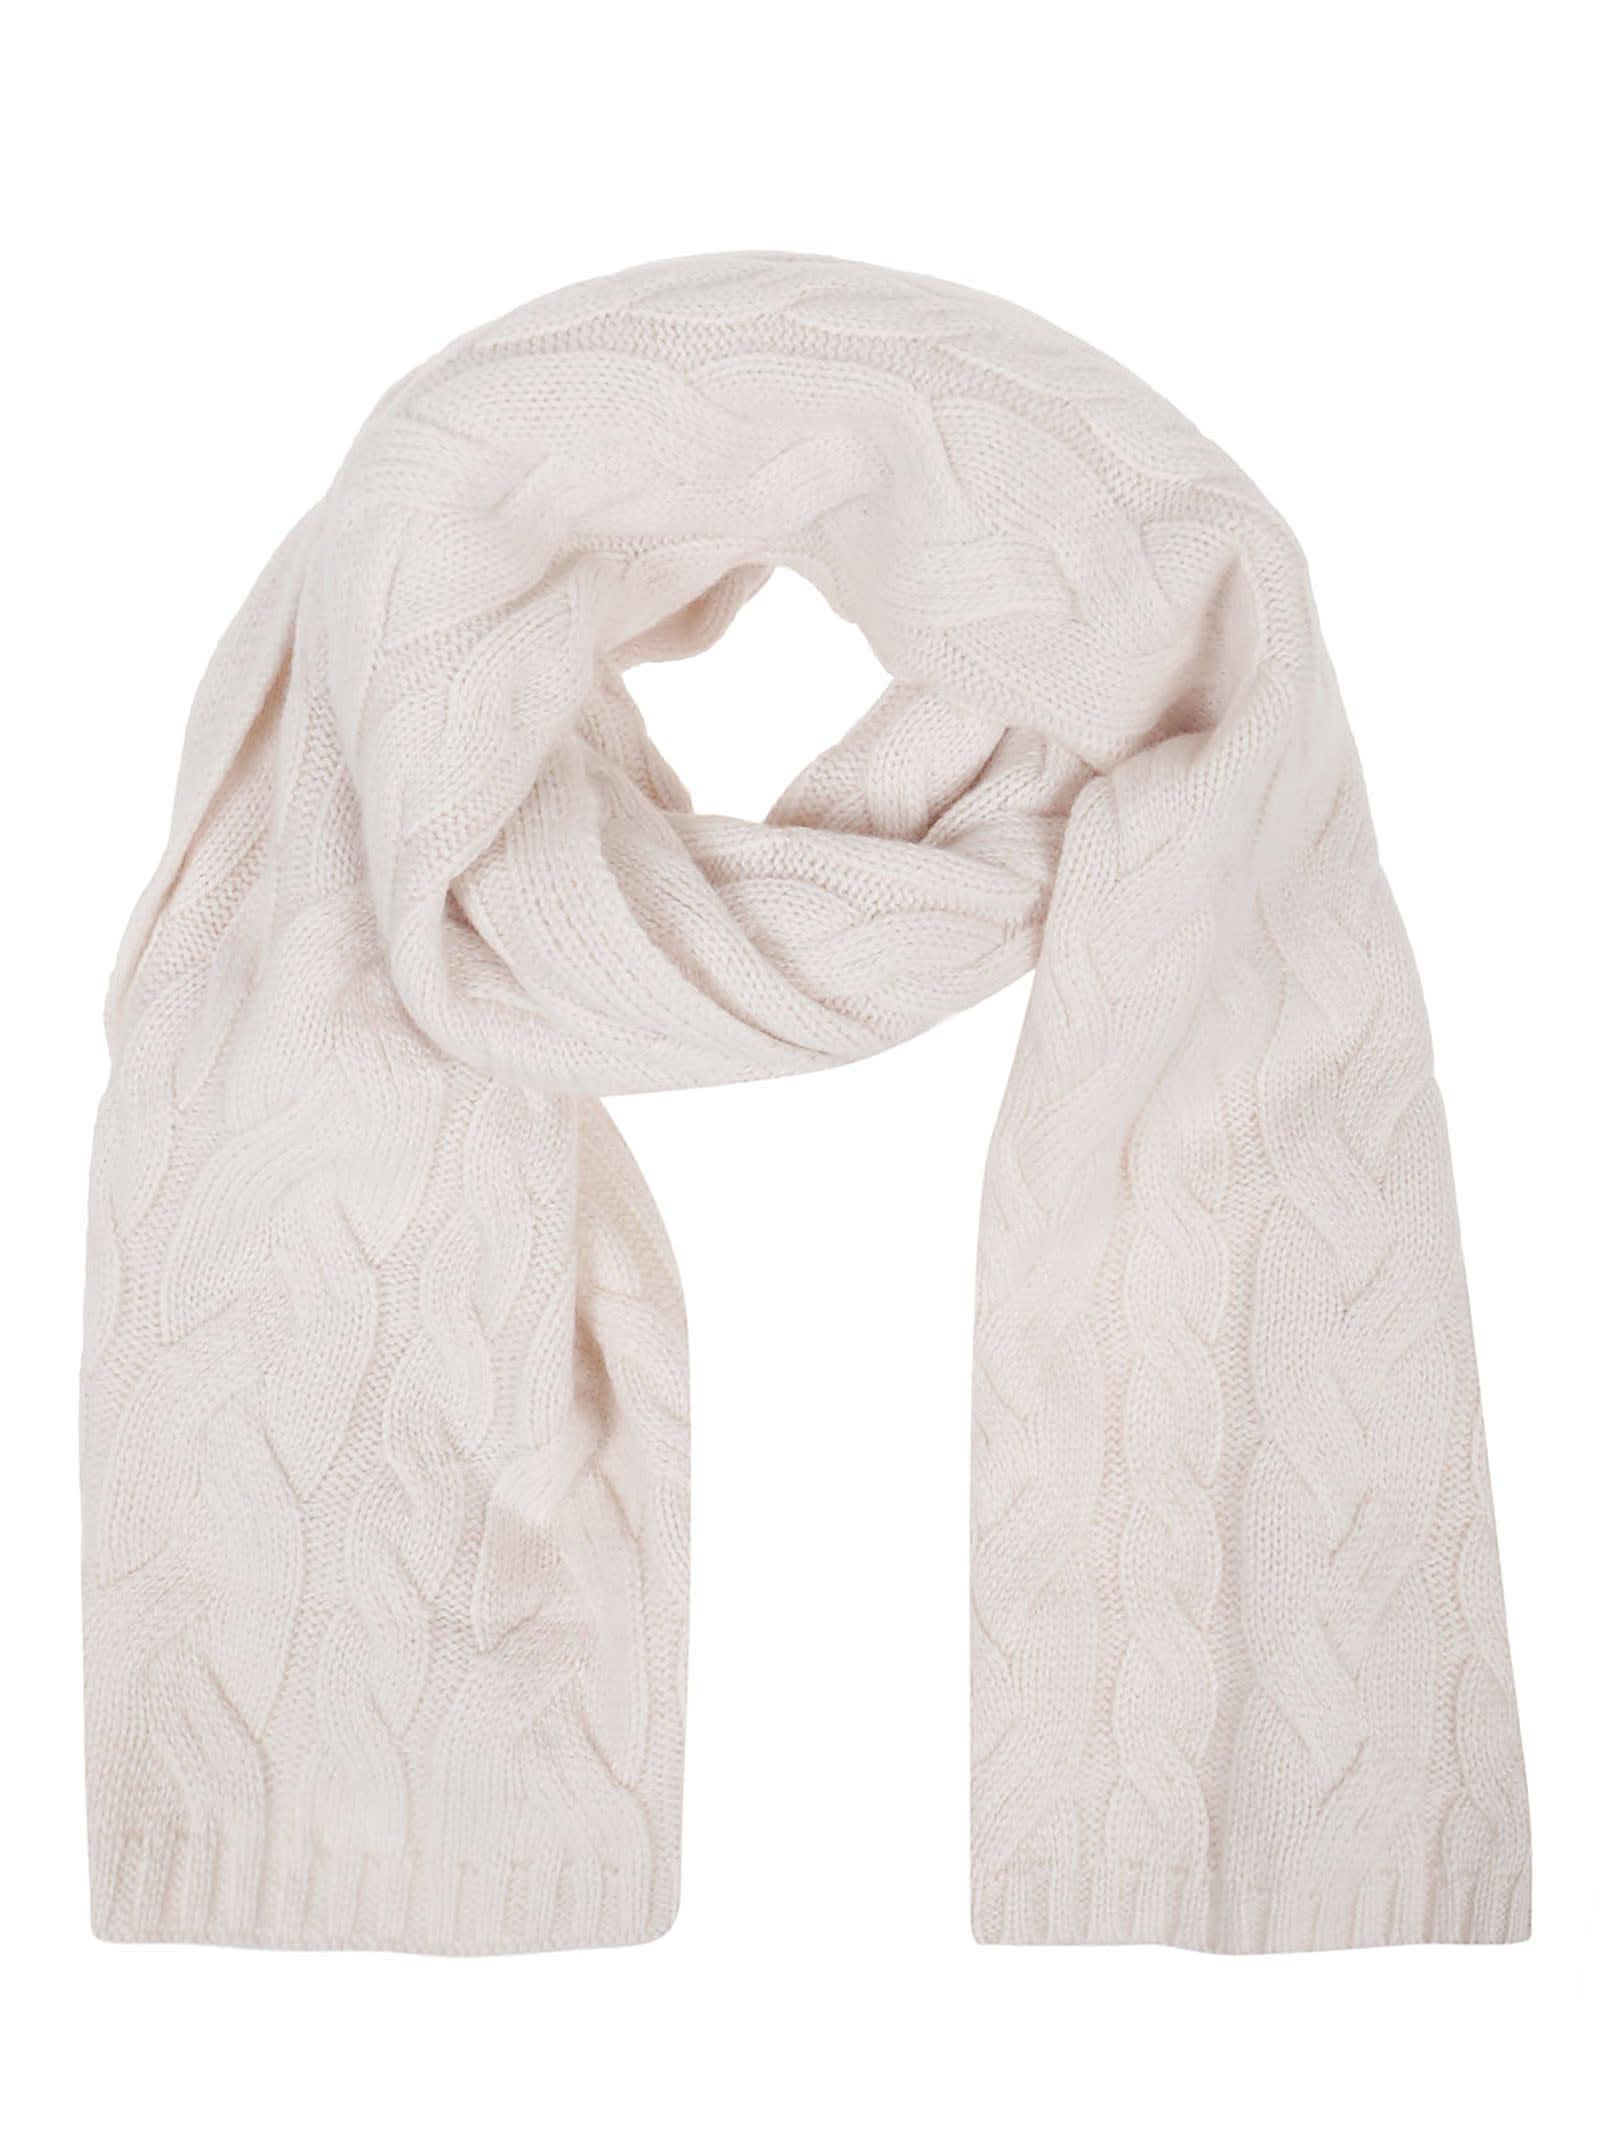 White Wool Scarf